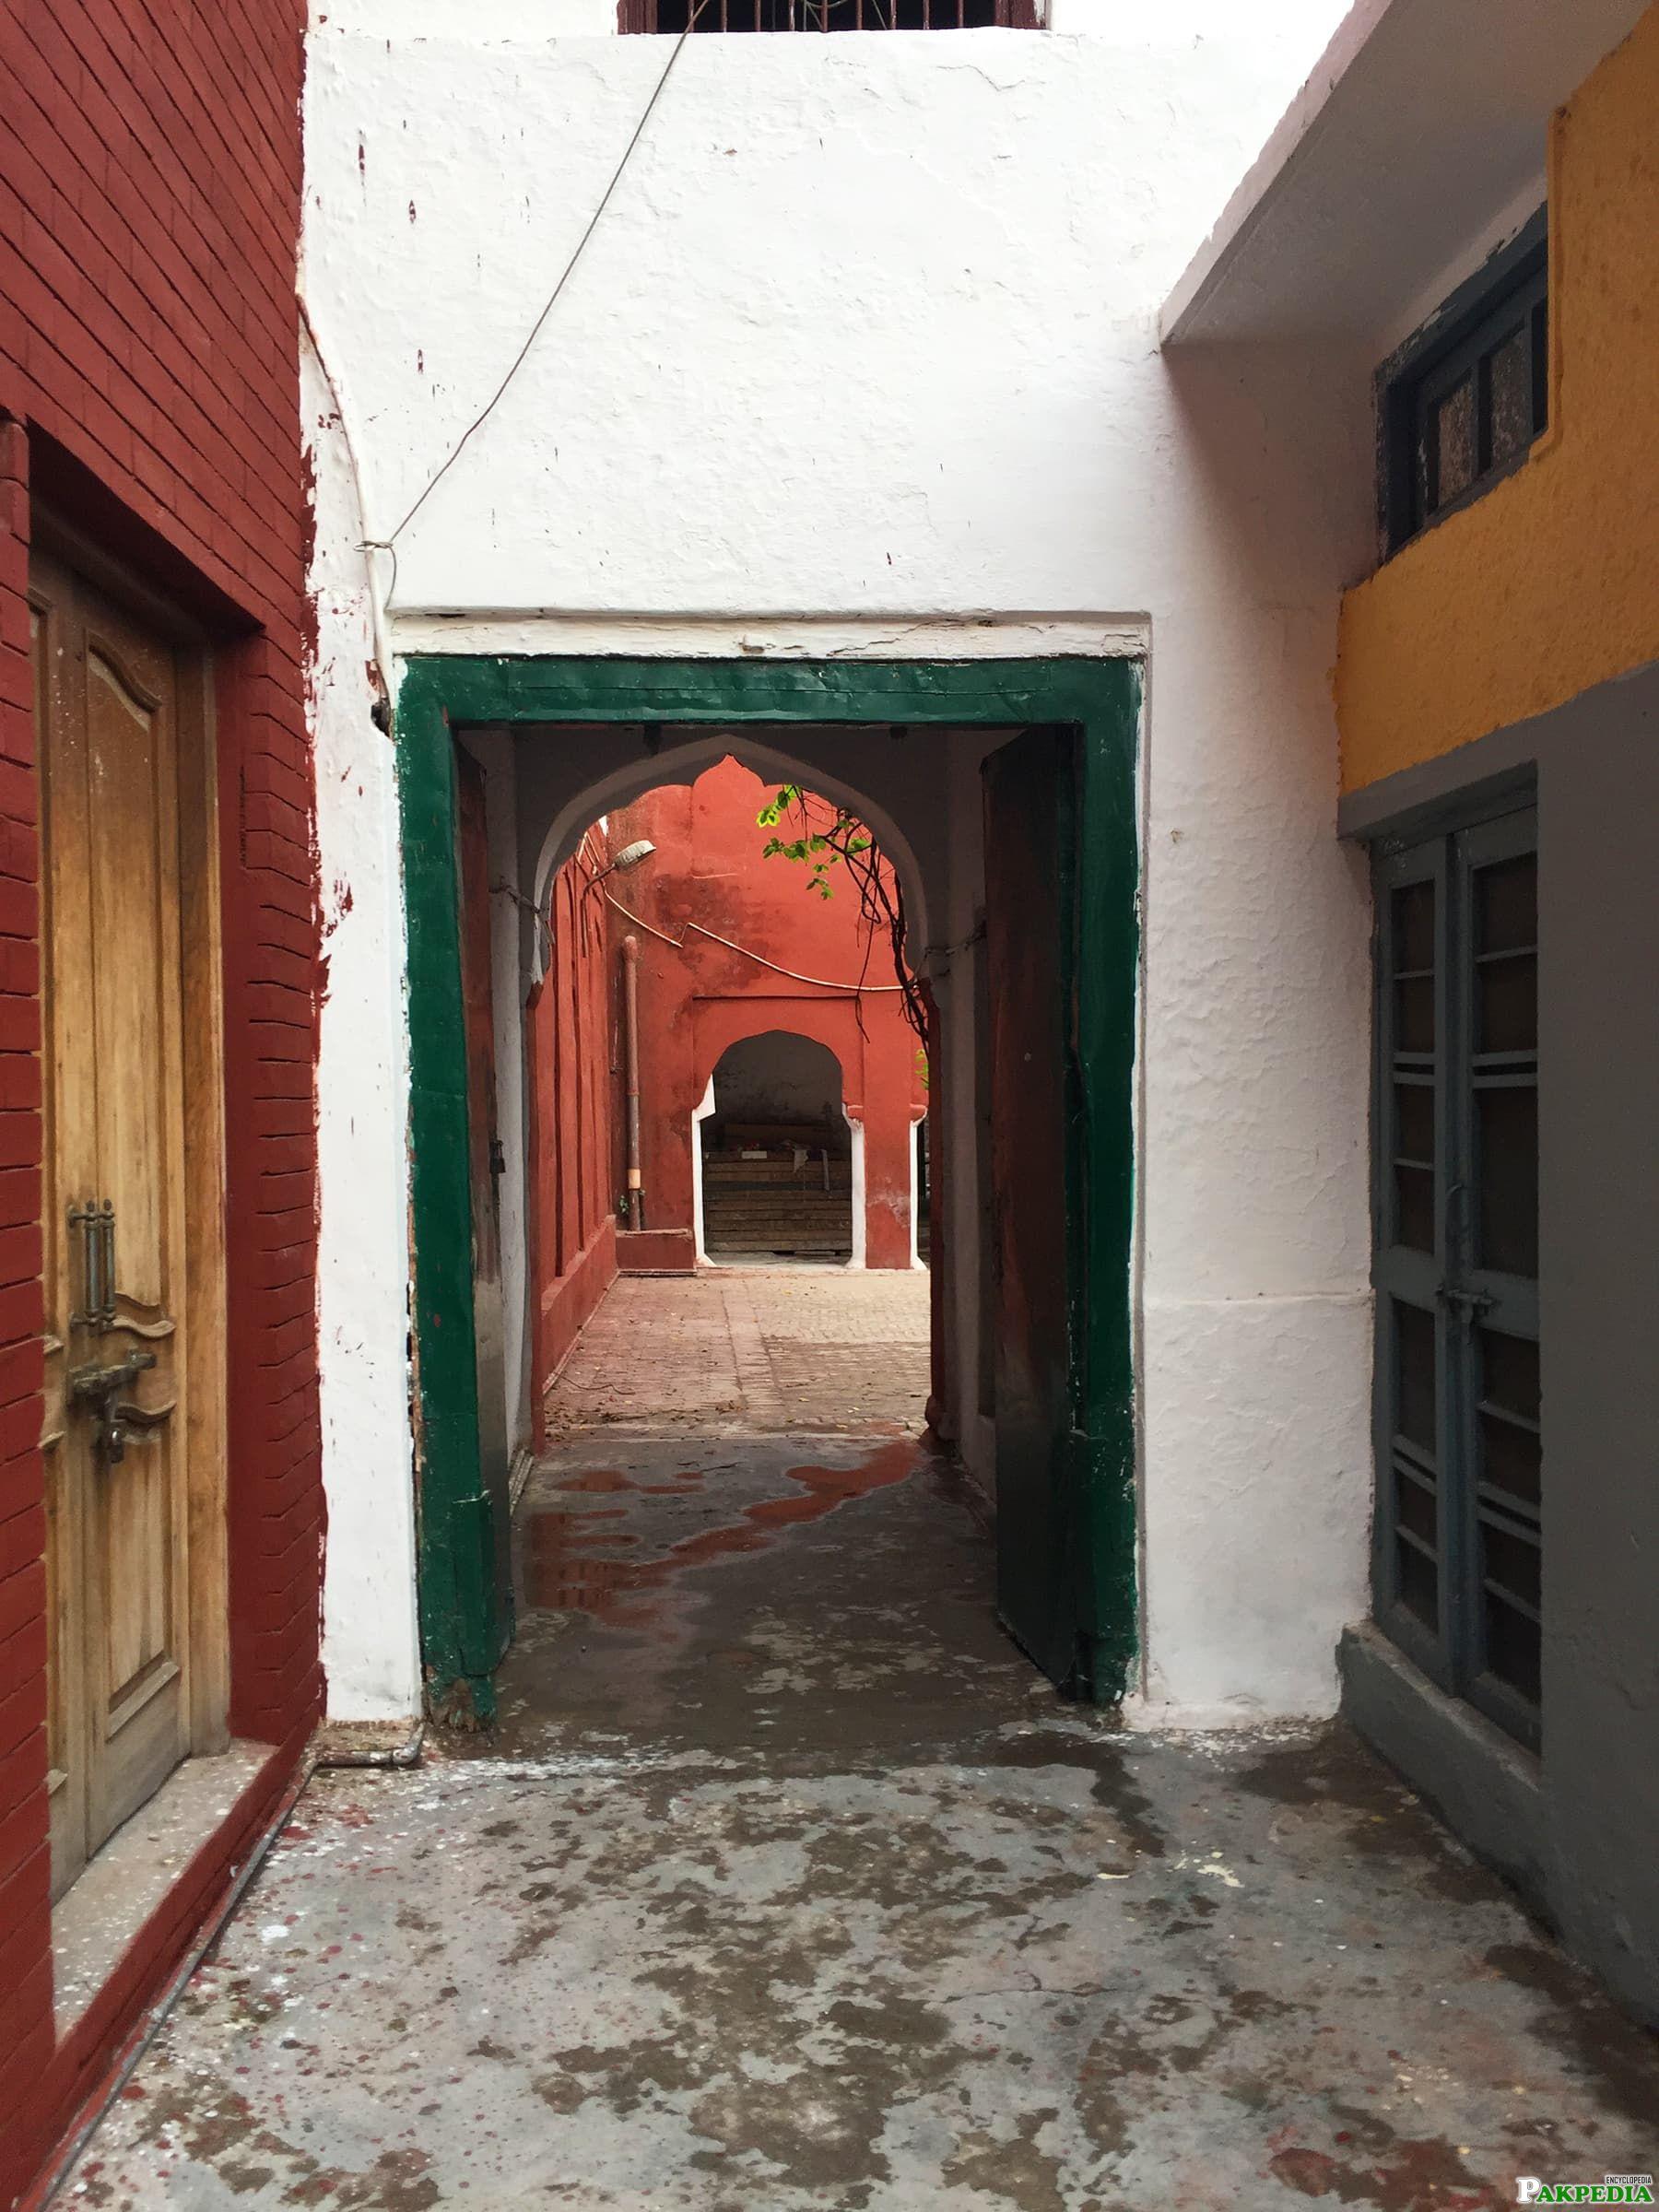 passage way to courtyard of haveli